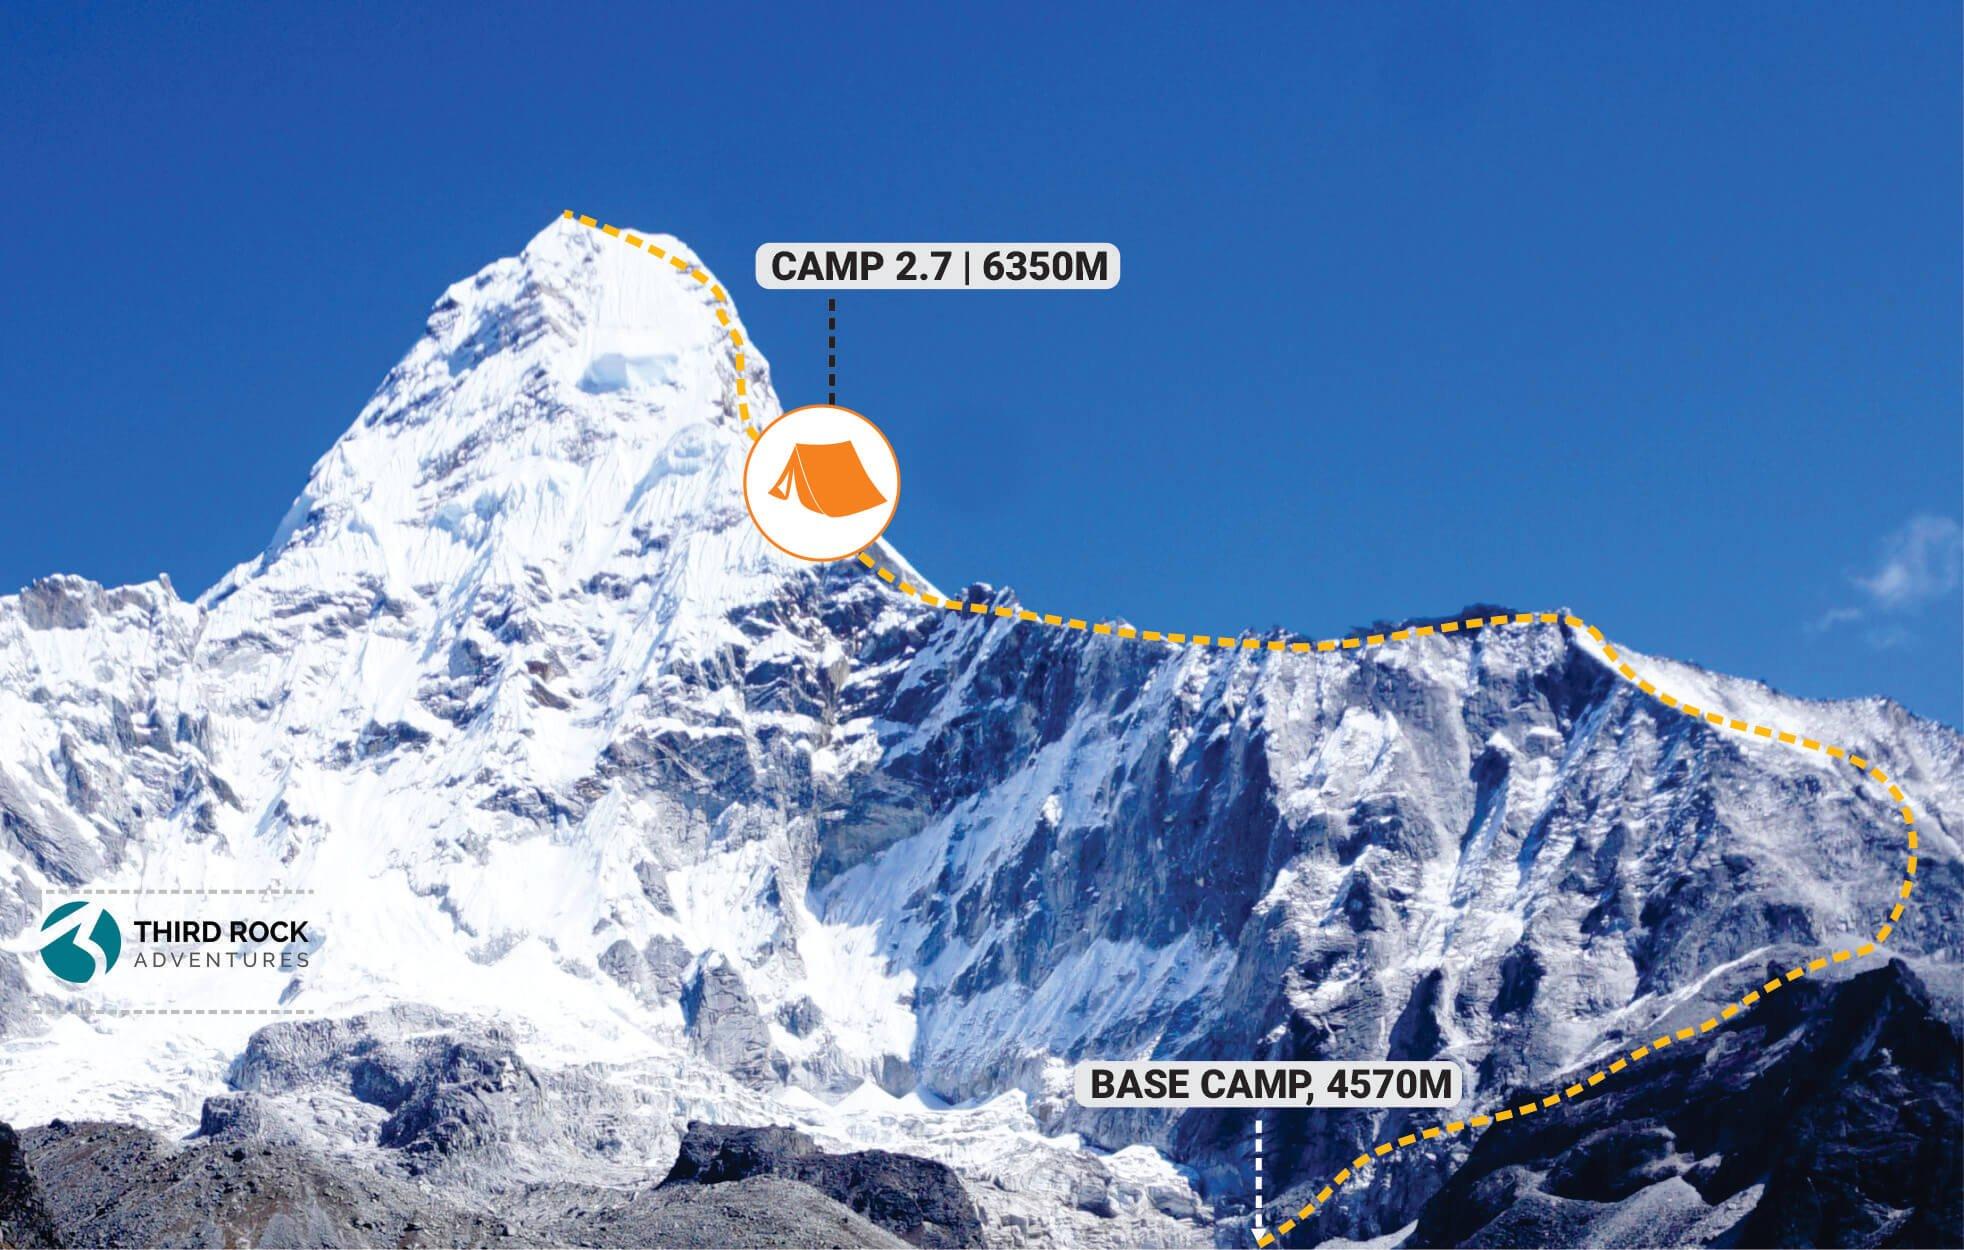 Ama Dablam Climb - Camp 2.7